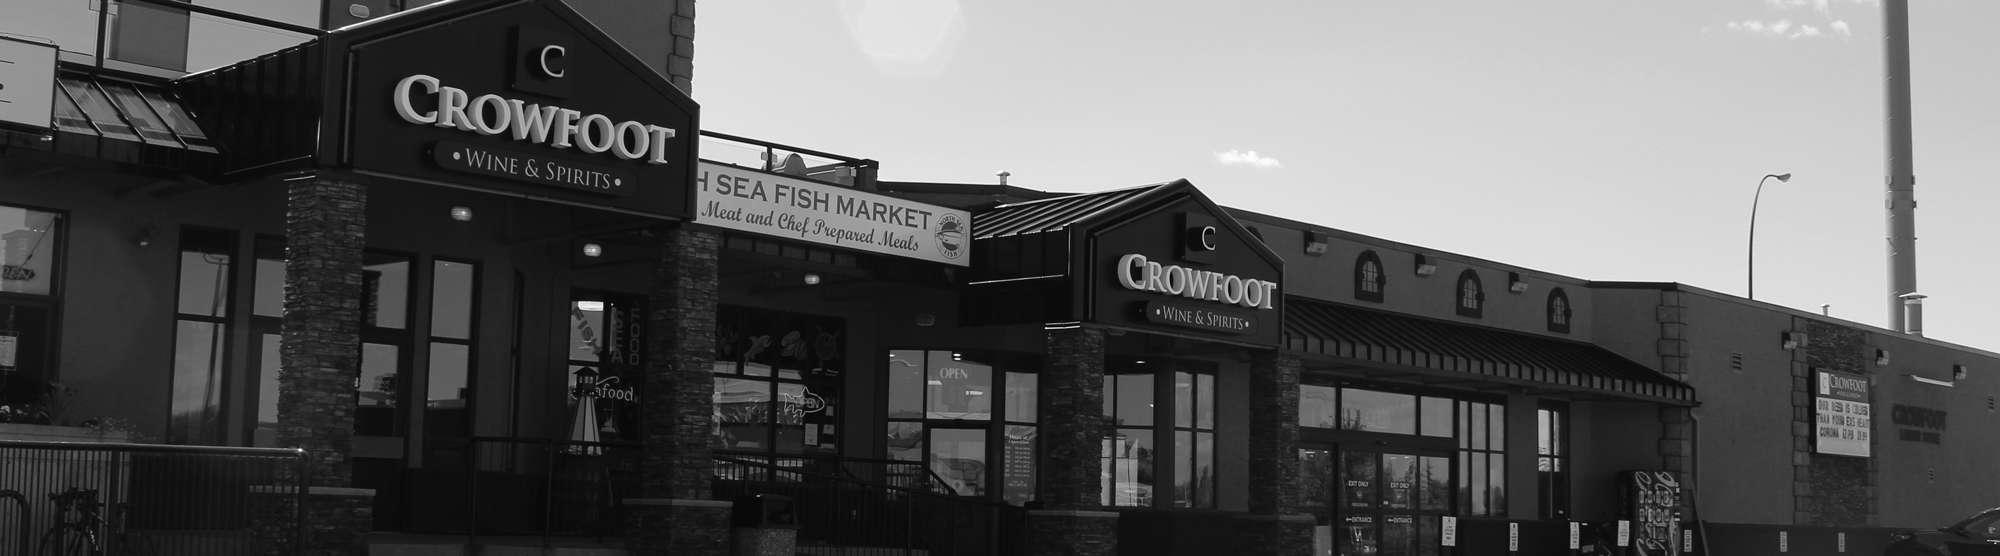 crowfoot store large